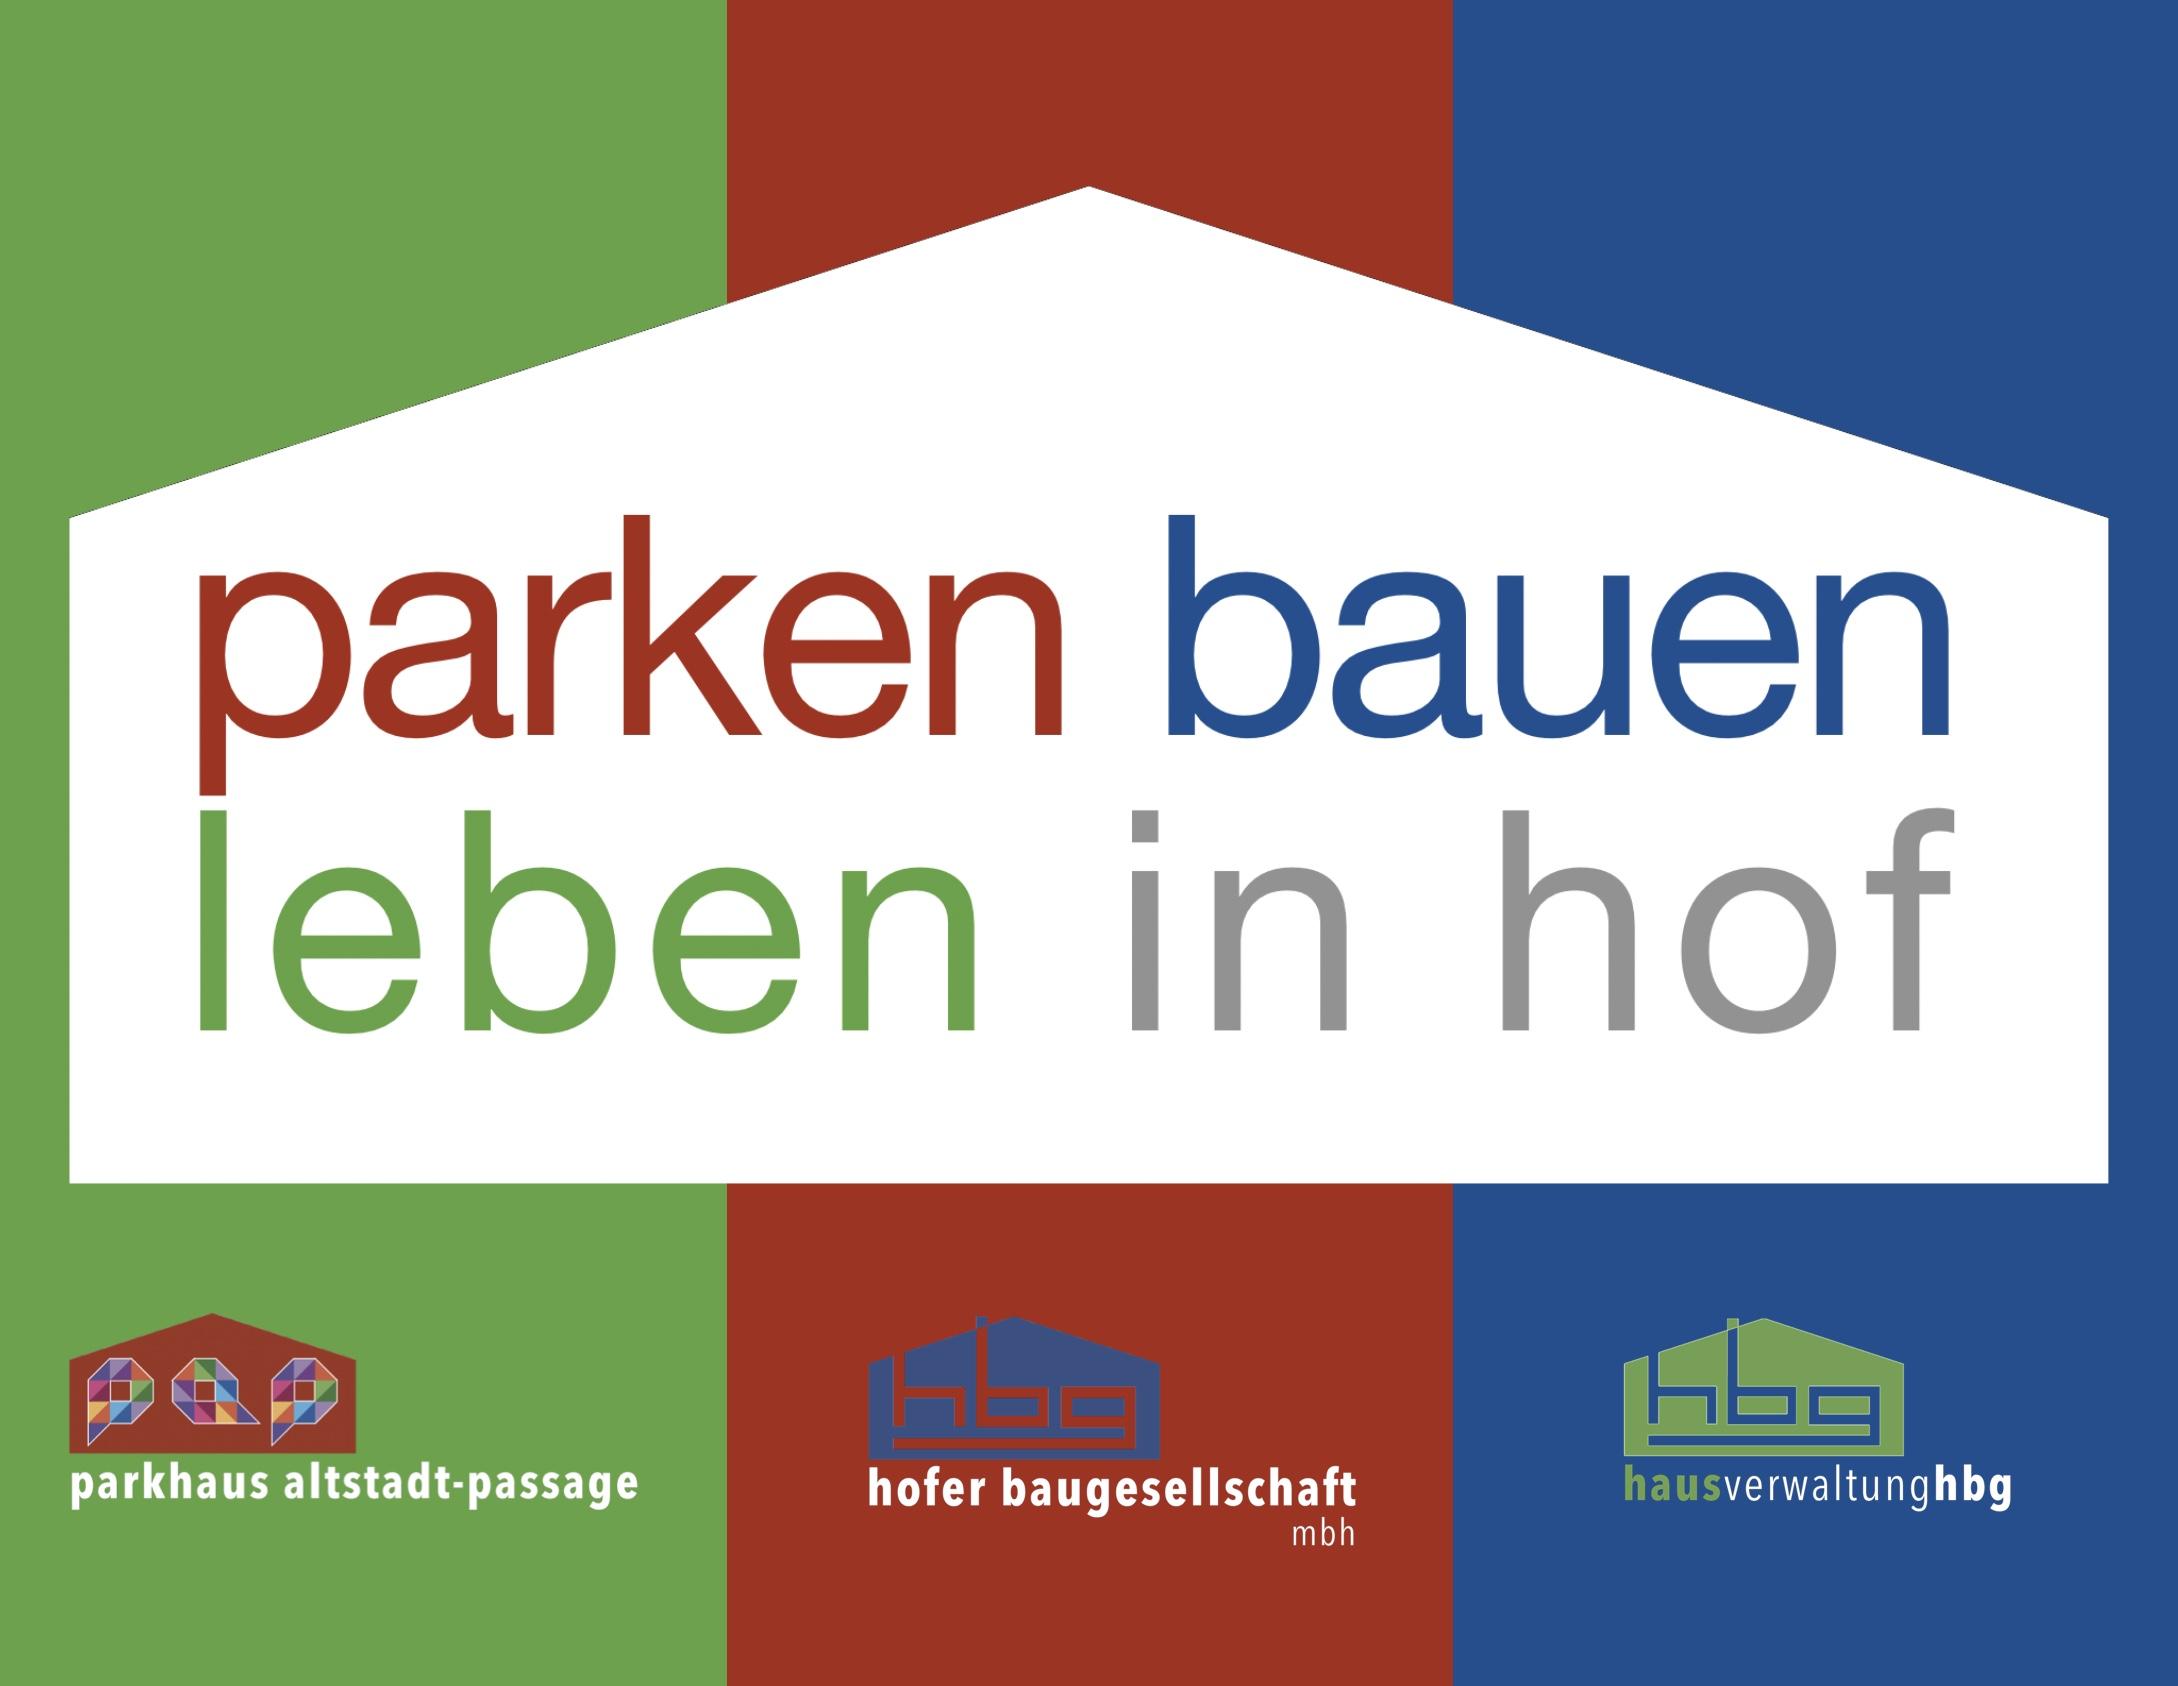 parken-bauen-leben Plakat Bauzaun .png